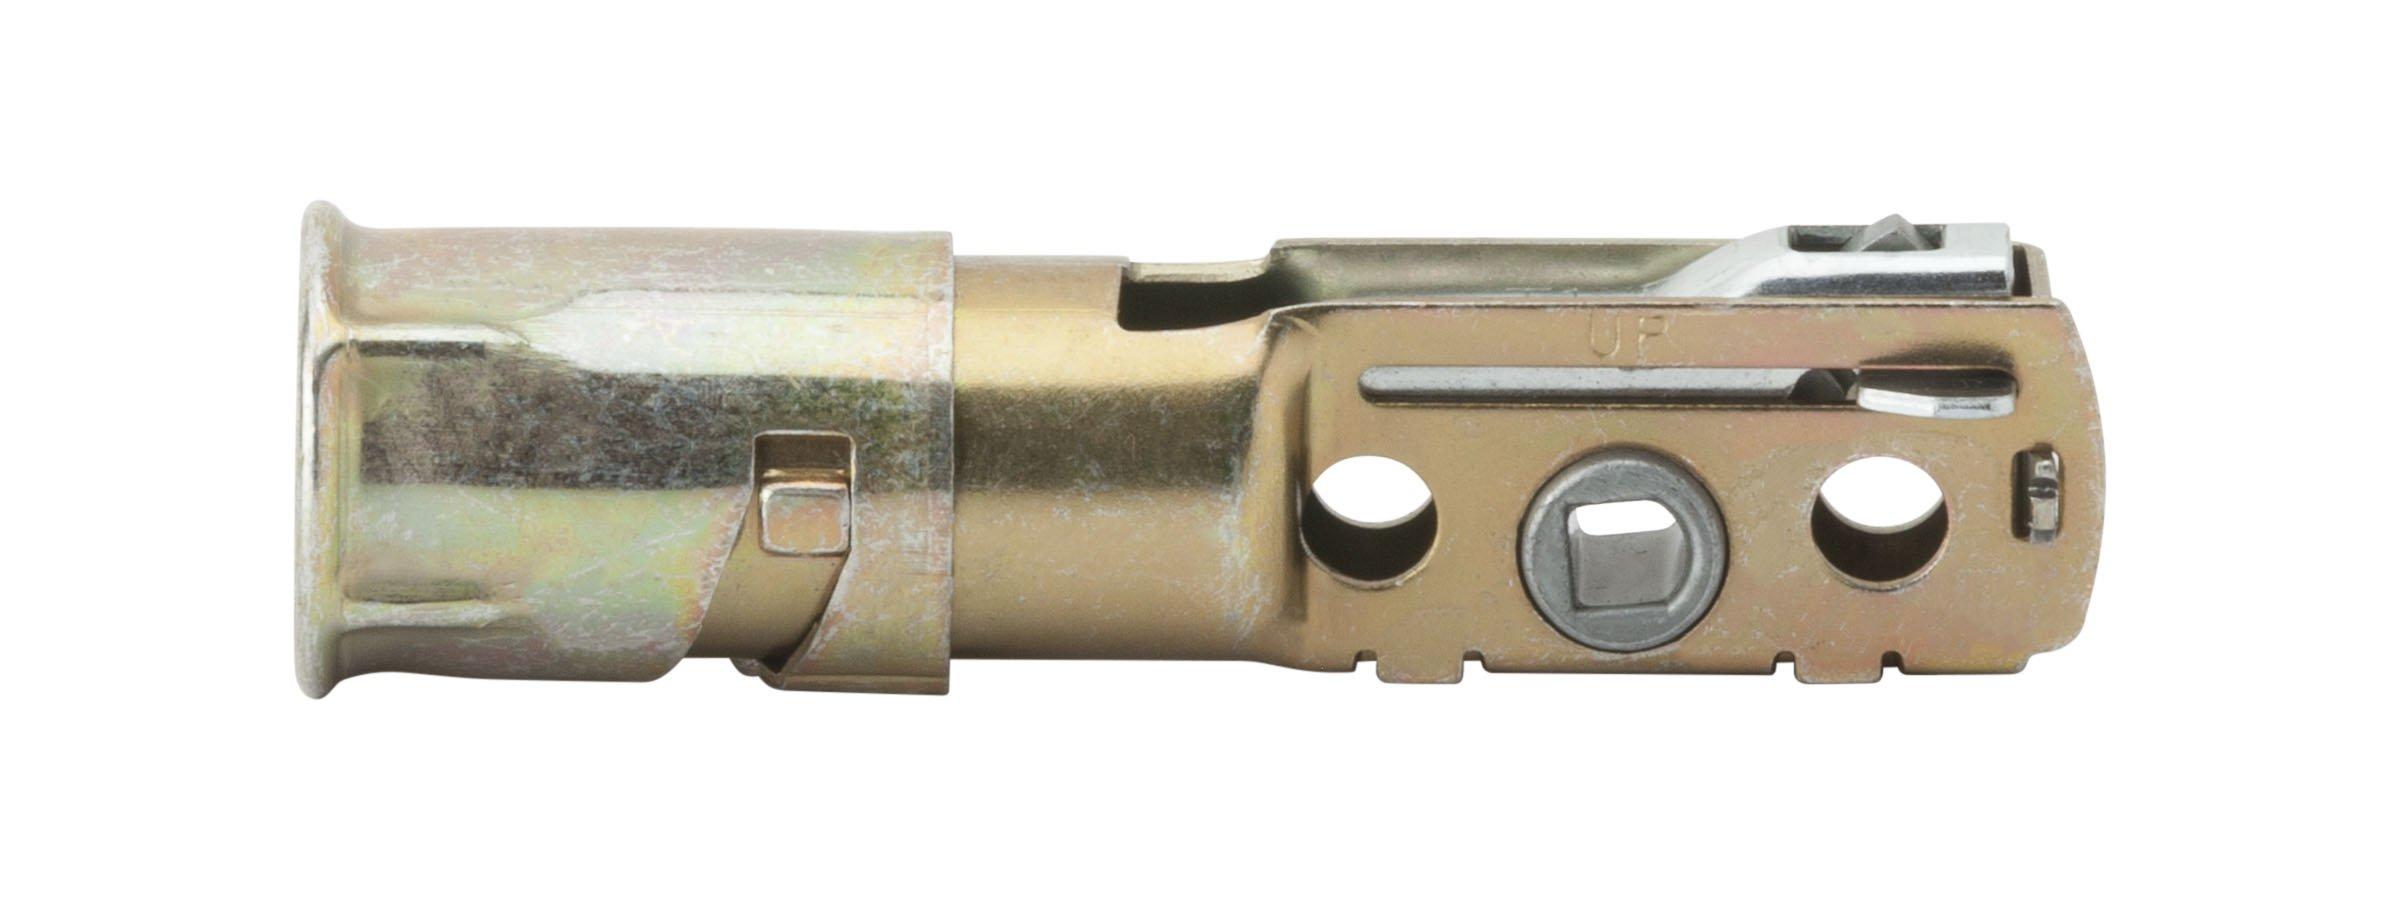 Kwikset 83186-001 Adjustable Drive-in Deadbolt Replacement Latch